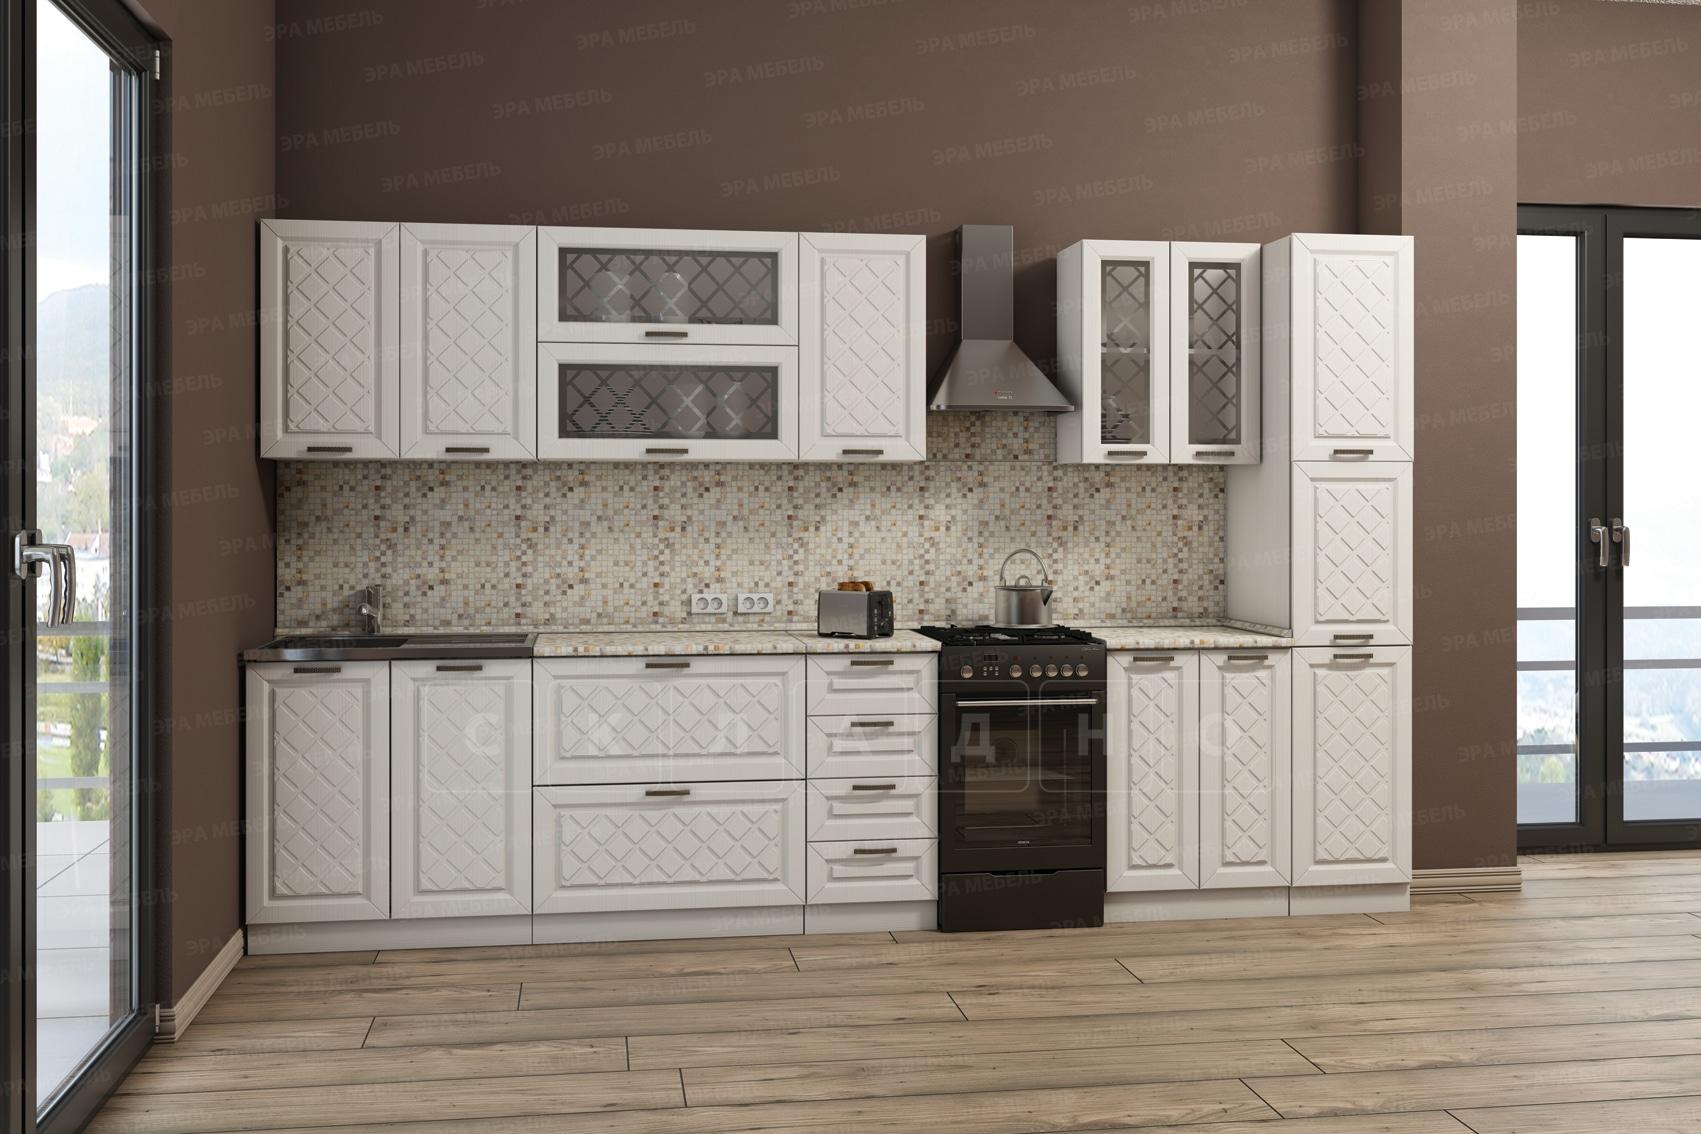 Кухонный гарнитур с пеналом Агава 3,0 м вариант 1 фото 1 | интернет-магазин Складно